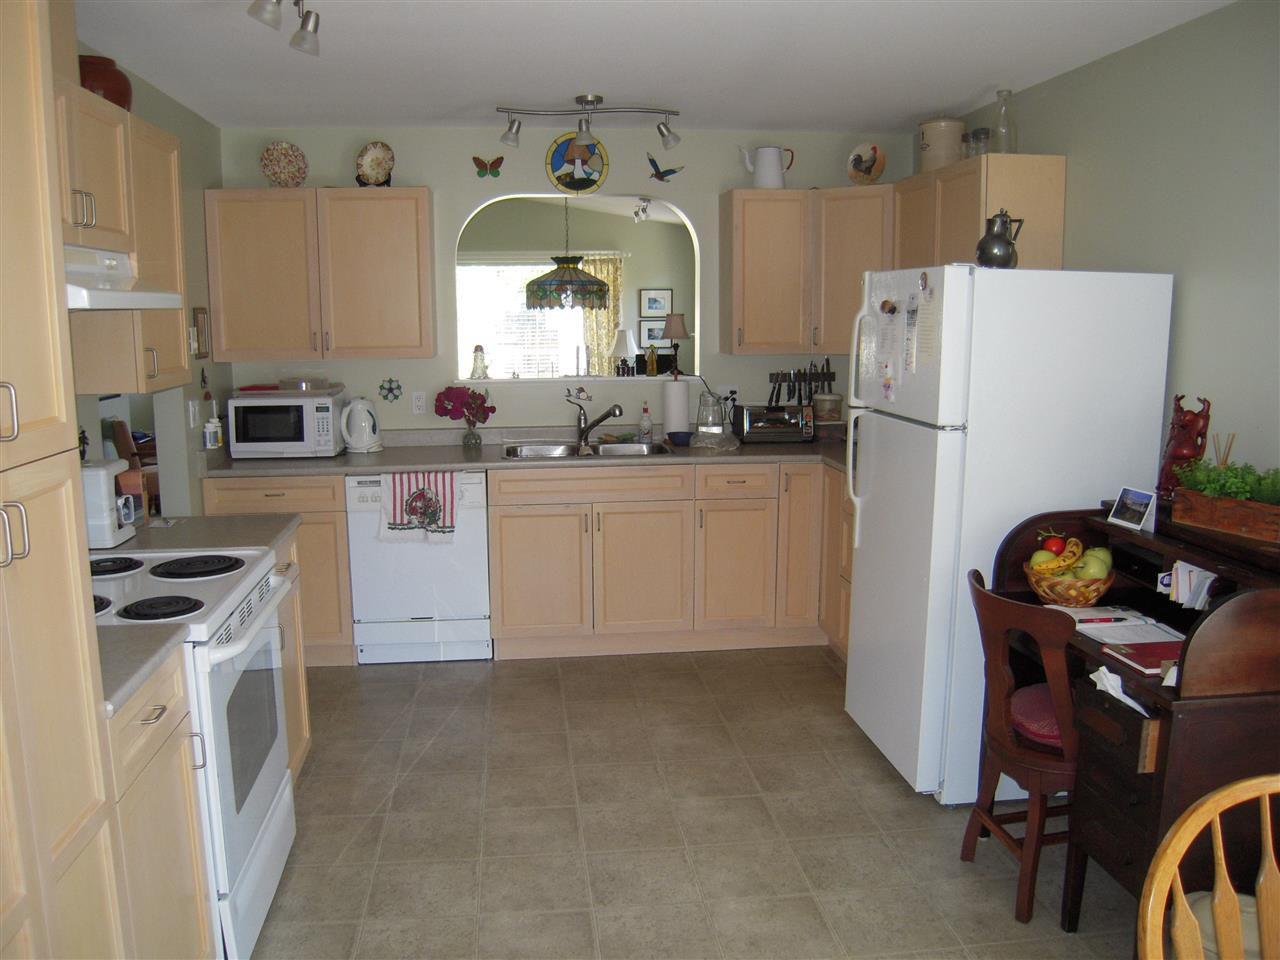 Photo 9: Photos: 5735 EMILY Way in Sechelt: Sechelt District House for sale (Sunshine Coast)  : MLS®# R2179124